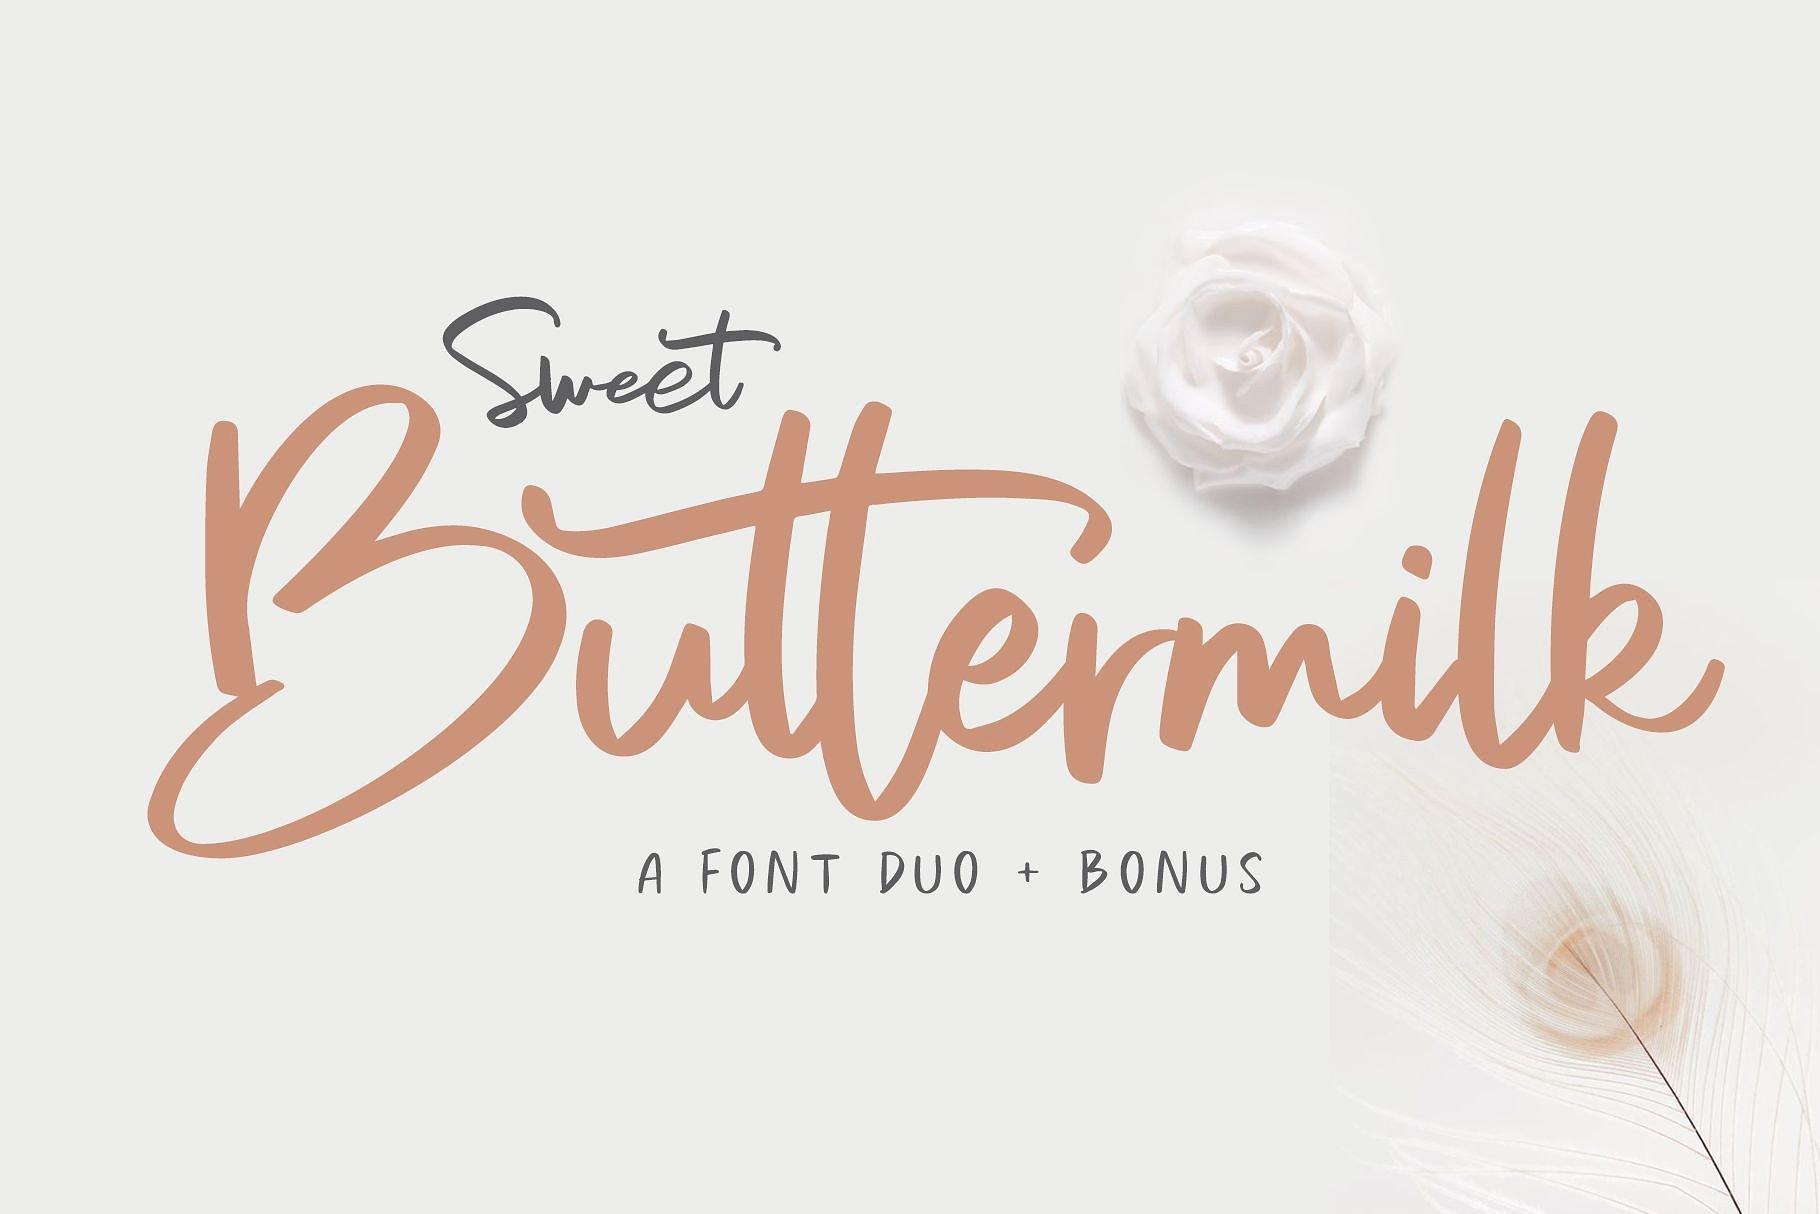 sweet-buttermilk-font-duo